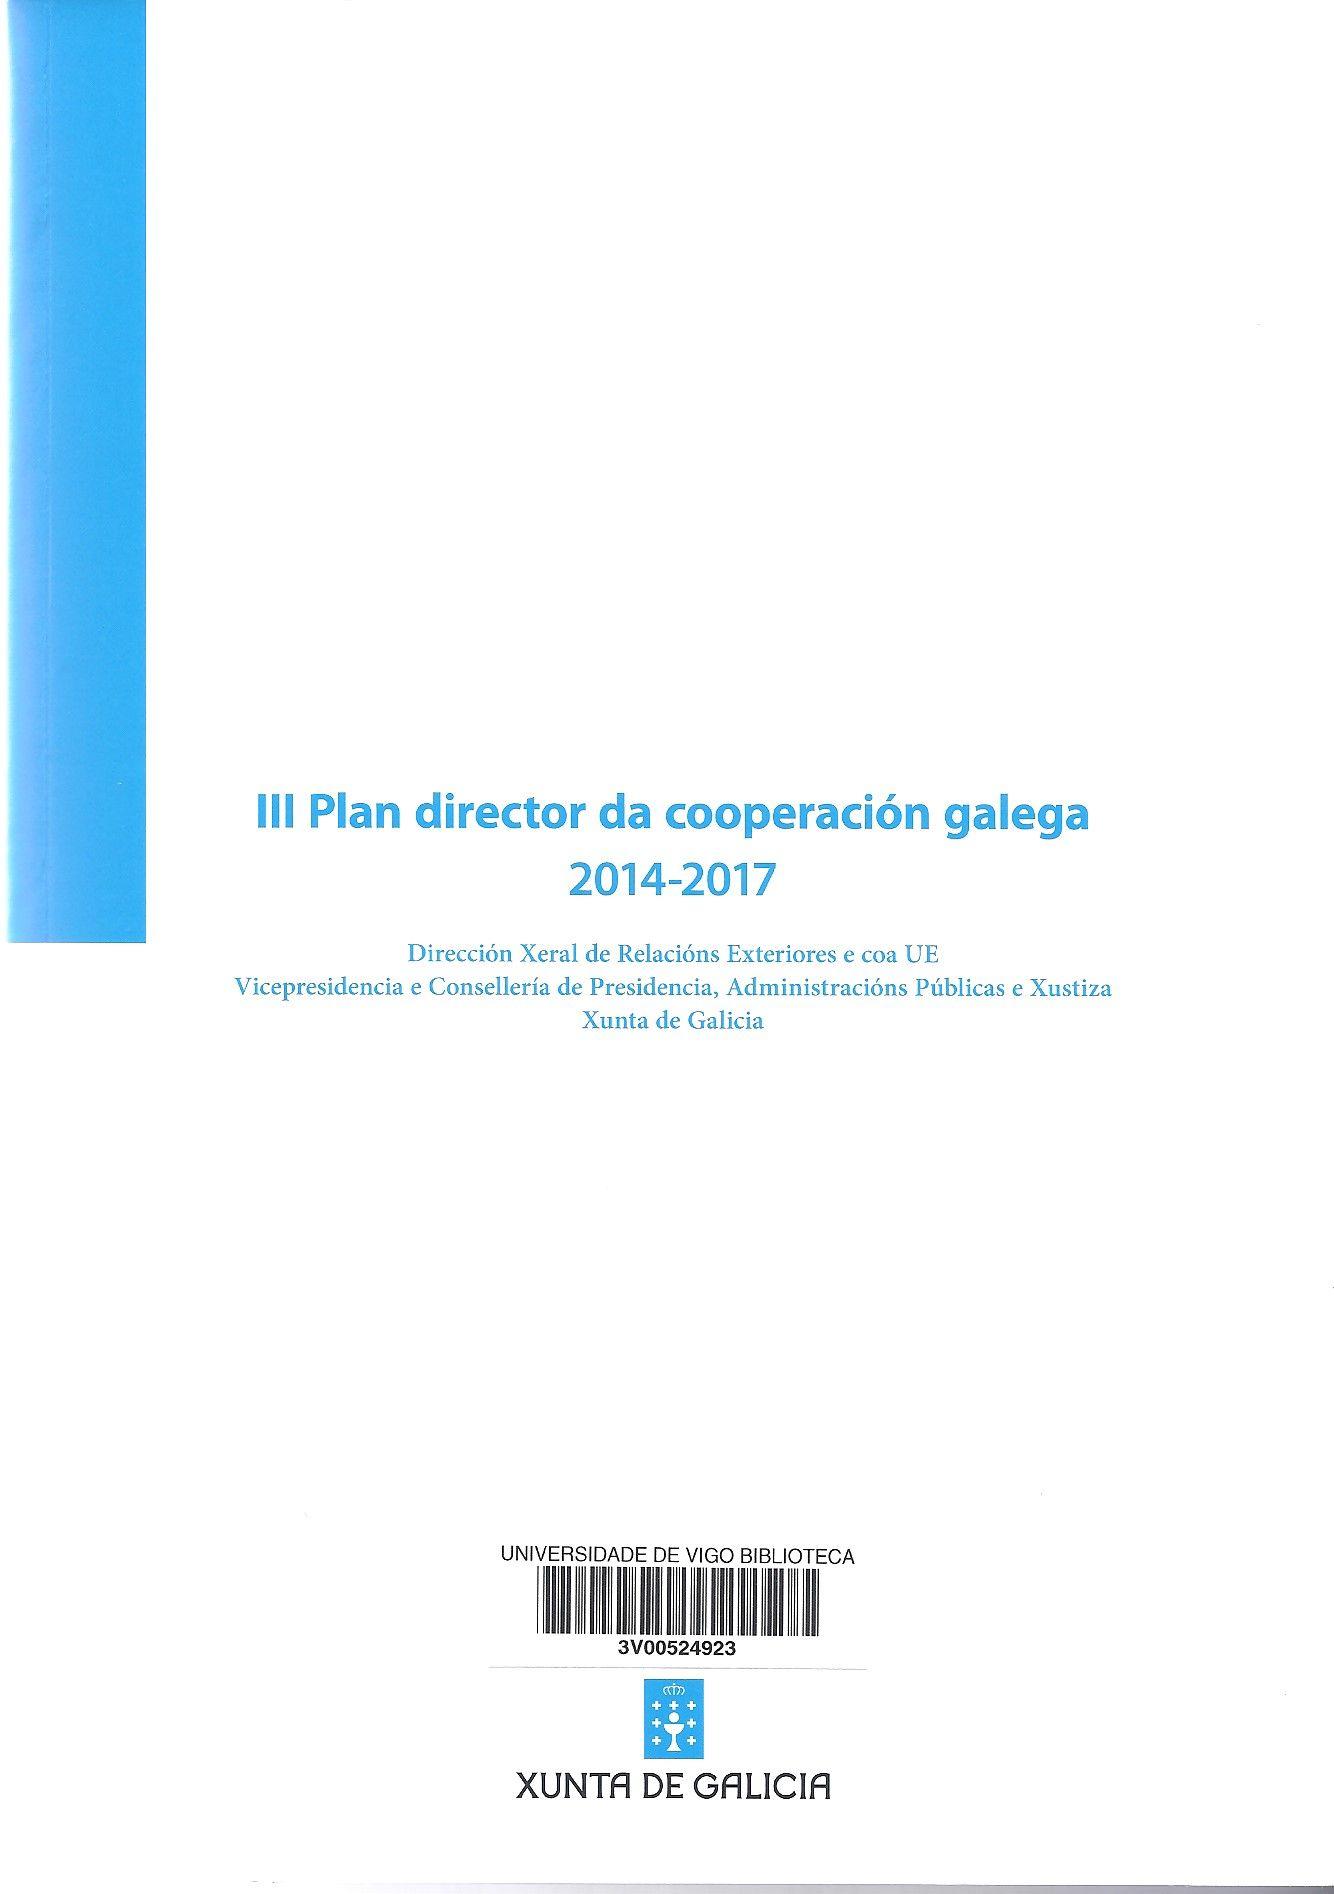 III Plan director da cooperación galega 2014-2017 = III Plan director de la cooperación gallega 2014-2017